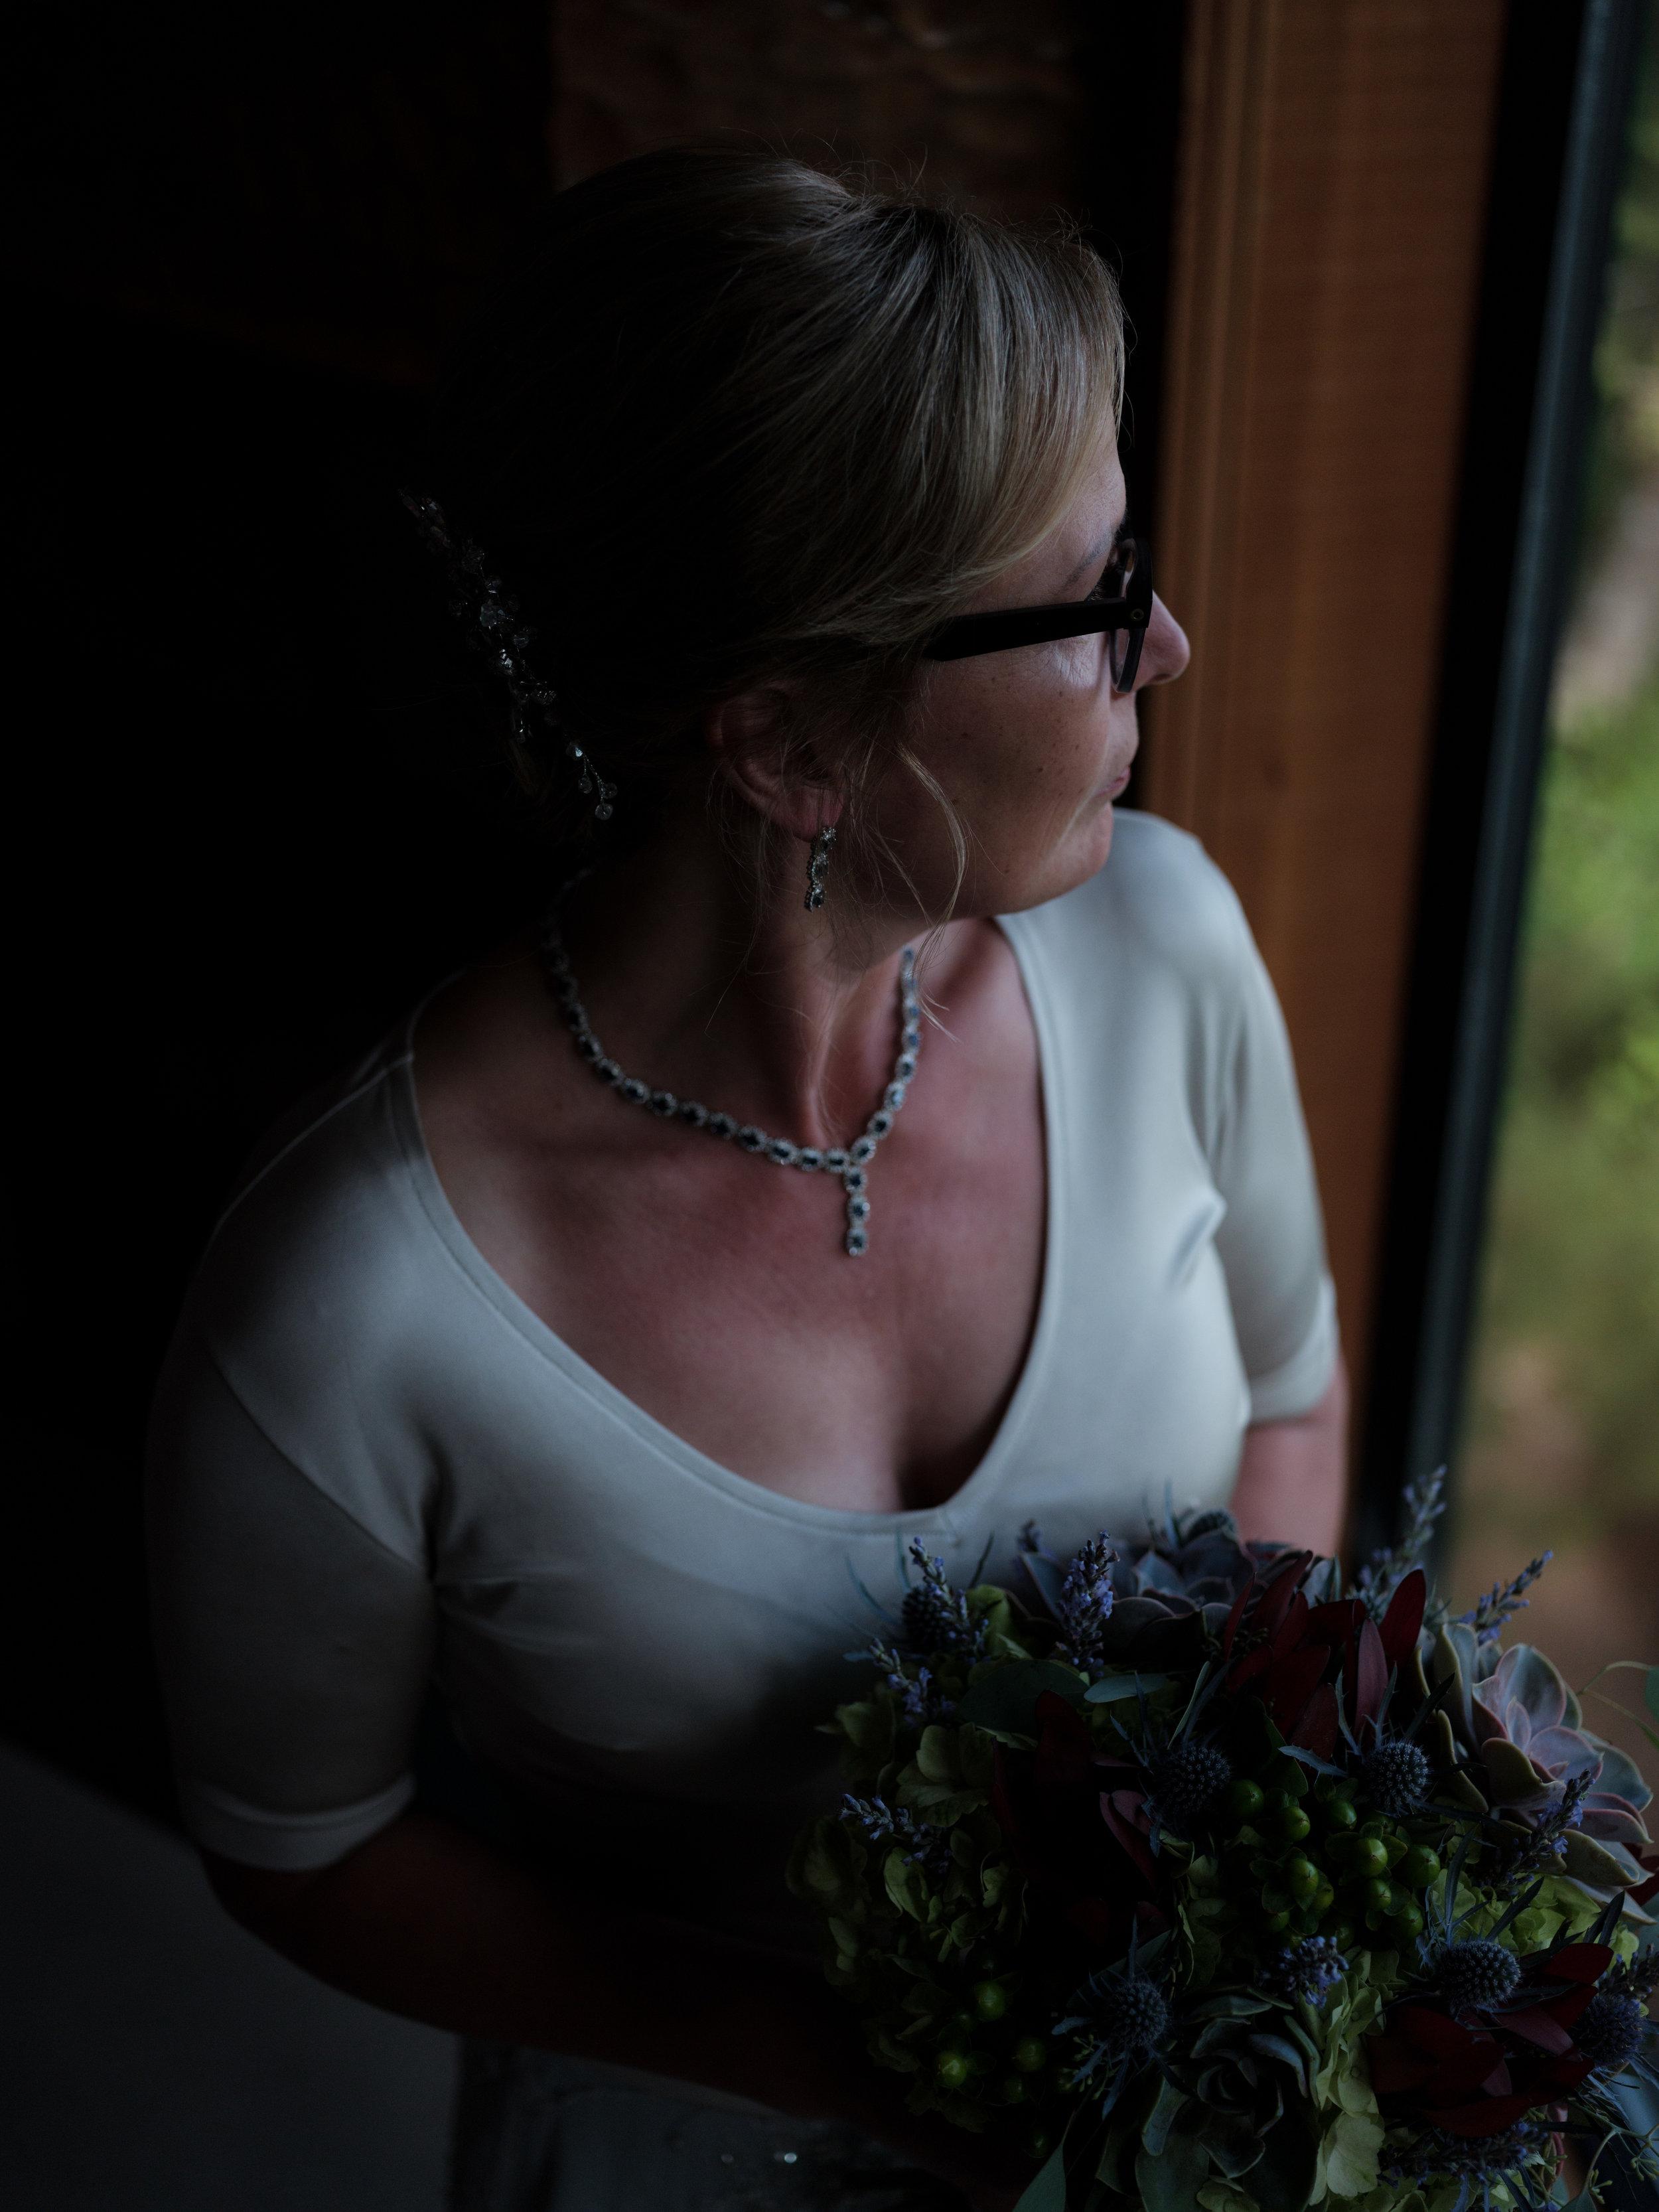 tofino ucluelet wedding engagement photographer photography PLP_18_07_SabineDonald-6.jpg